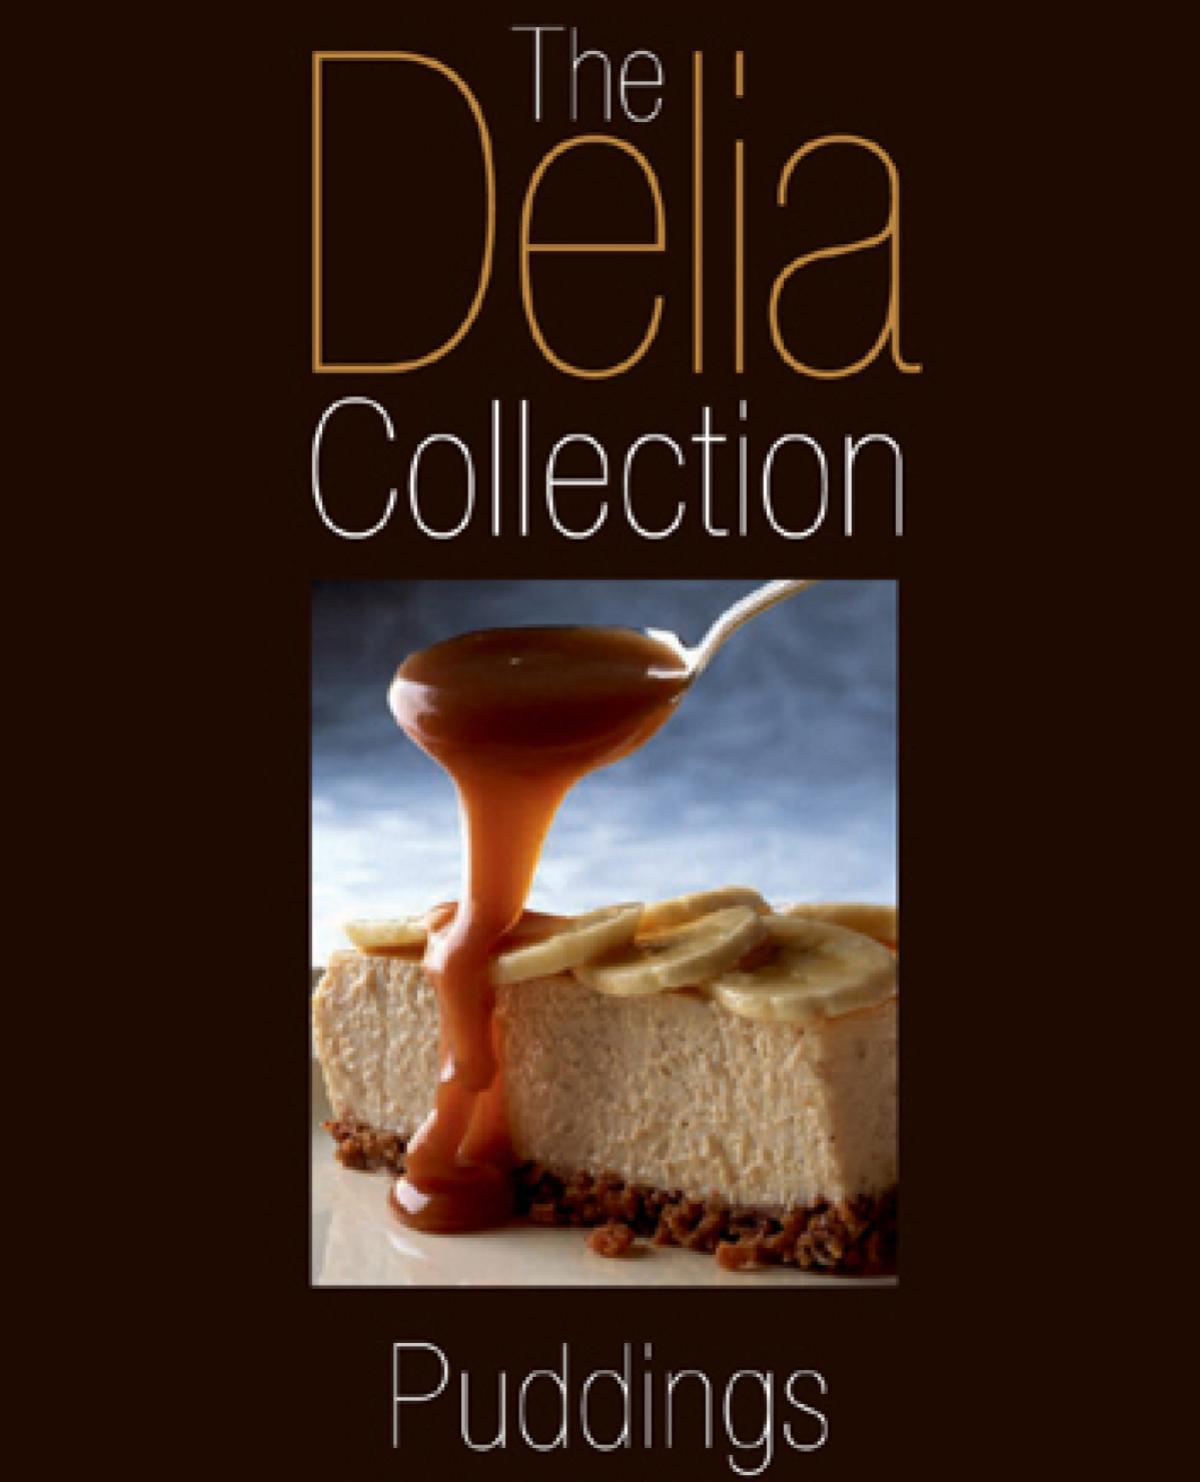 A picture of Delia's The Delia Collection: Puddings recipes